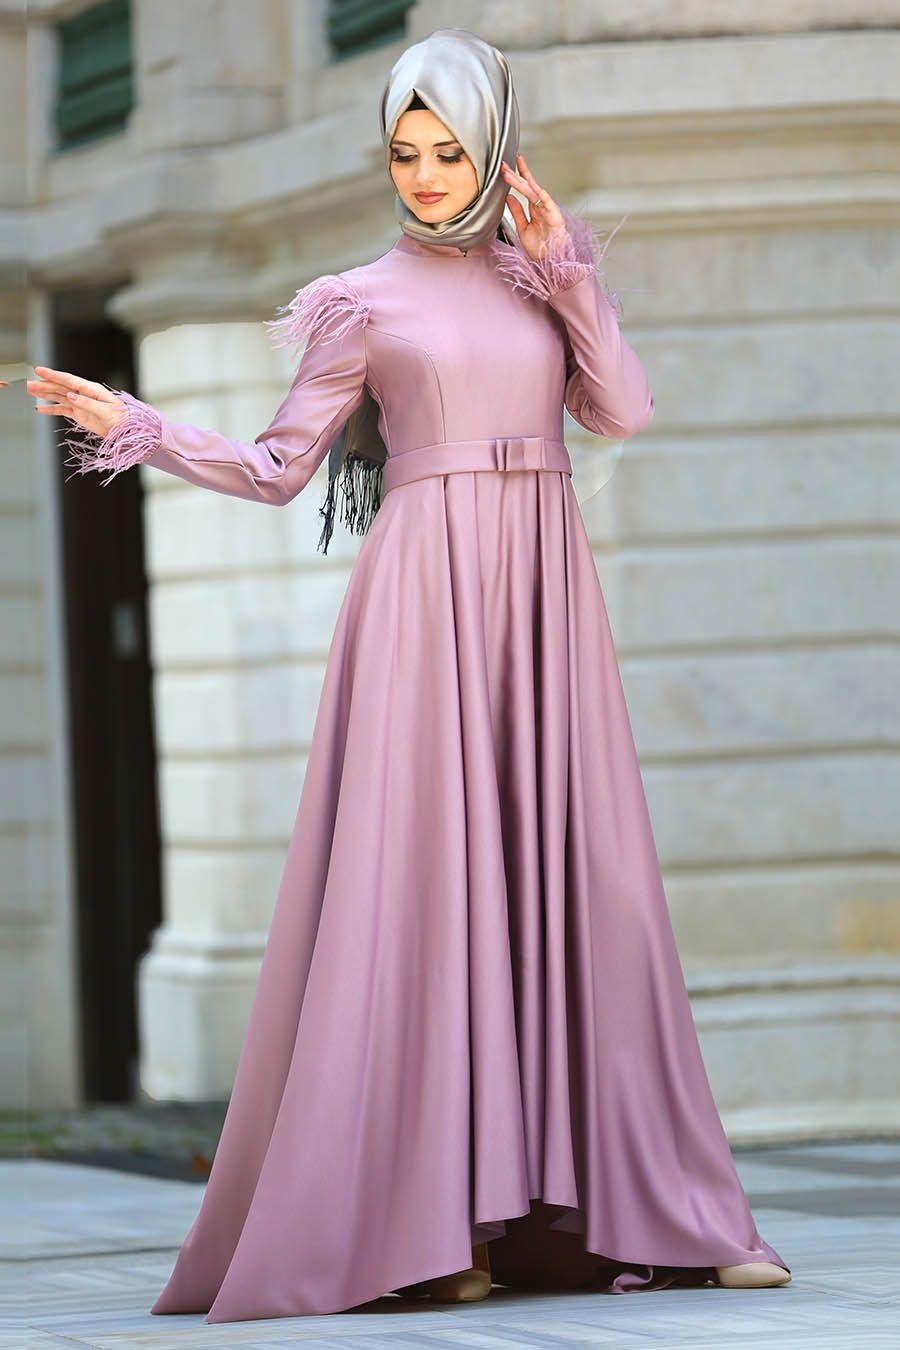 244a30bd000e0 2018 yeni sezon tesettür abiye elbise- Puane - Tüy Detaylı Gül Kurusu Tesettür  Abiye Elbise 8181GK